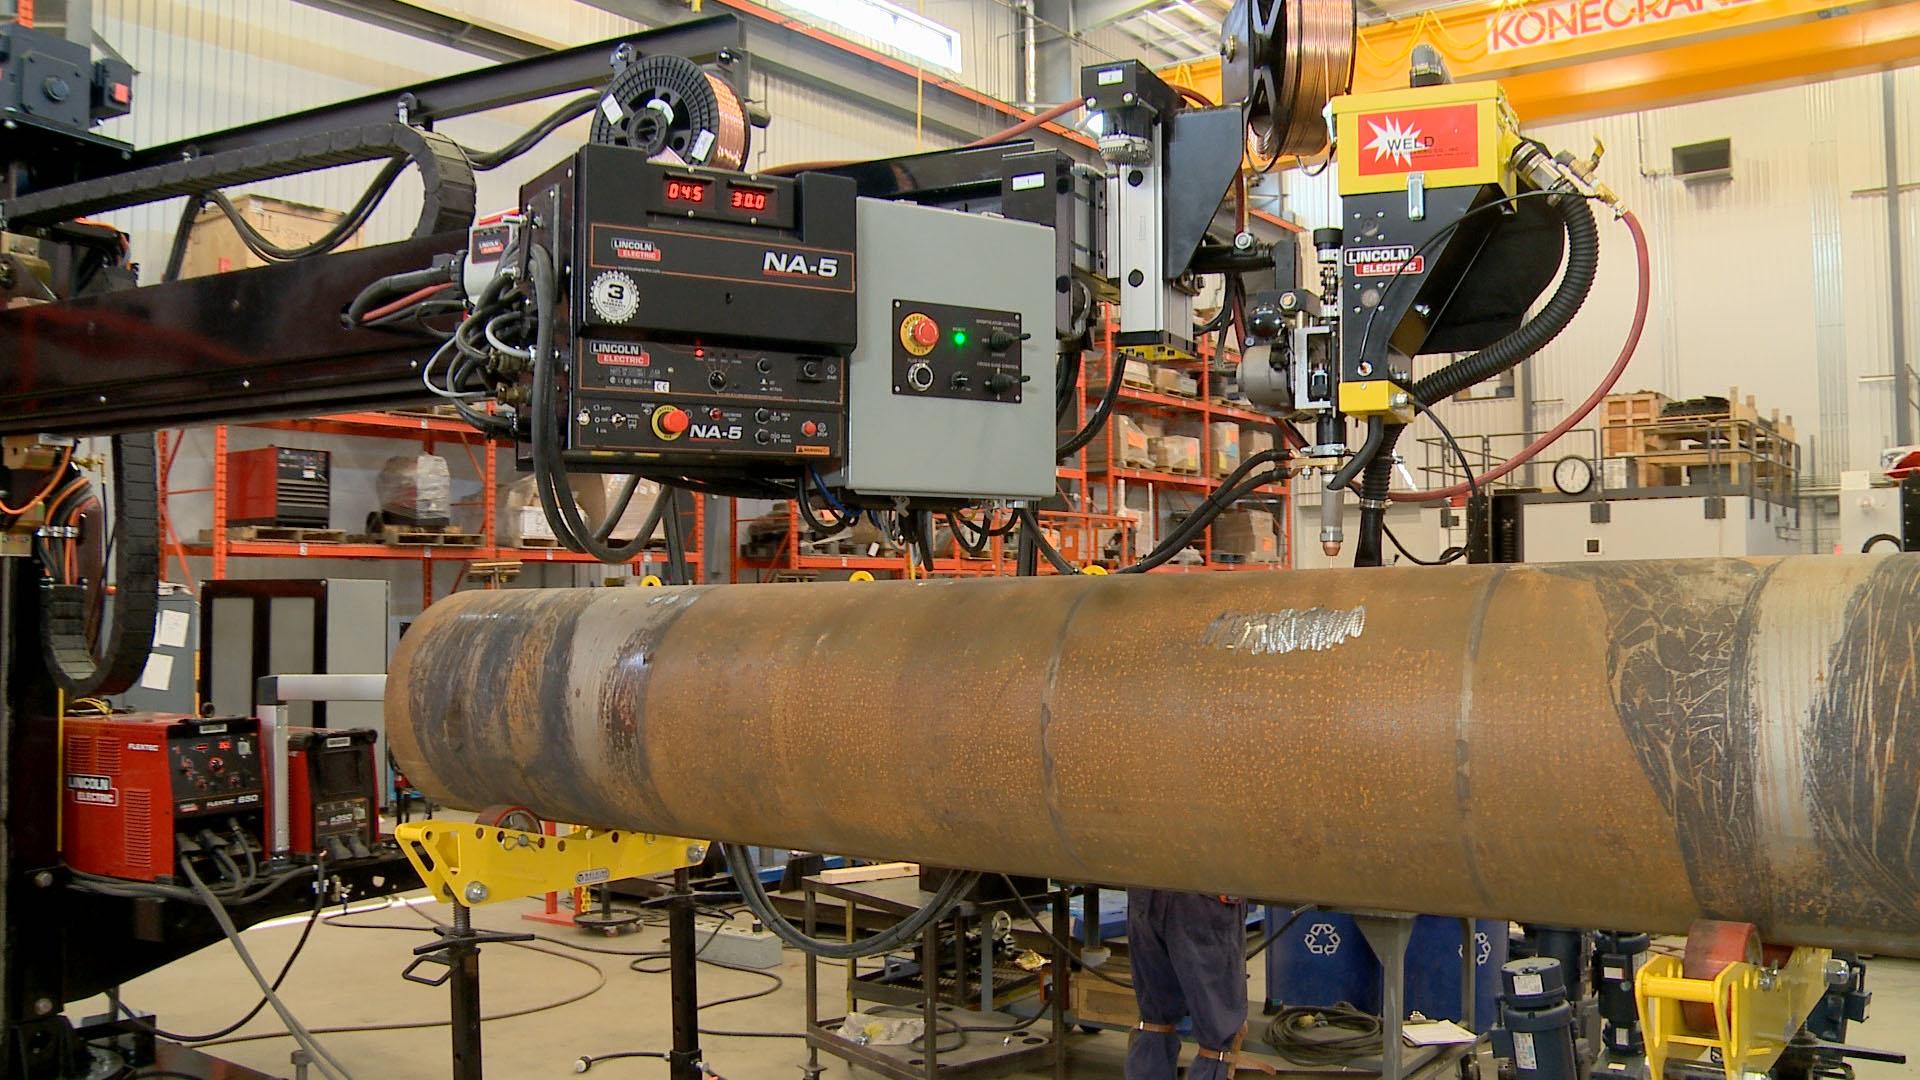 welding boom manipulator controls